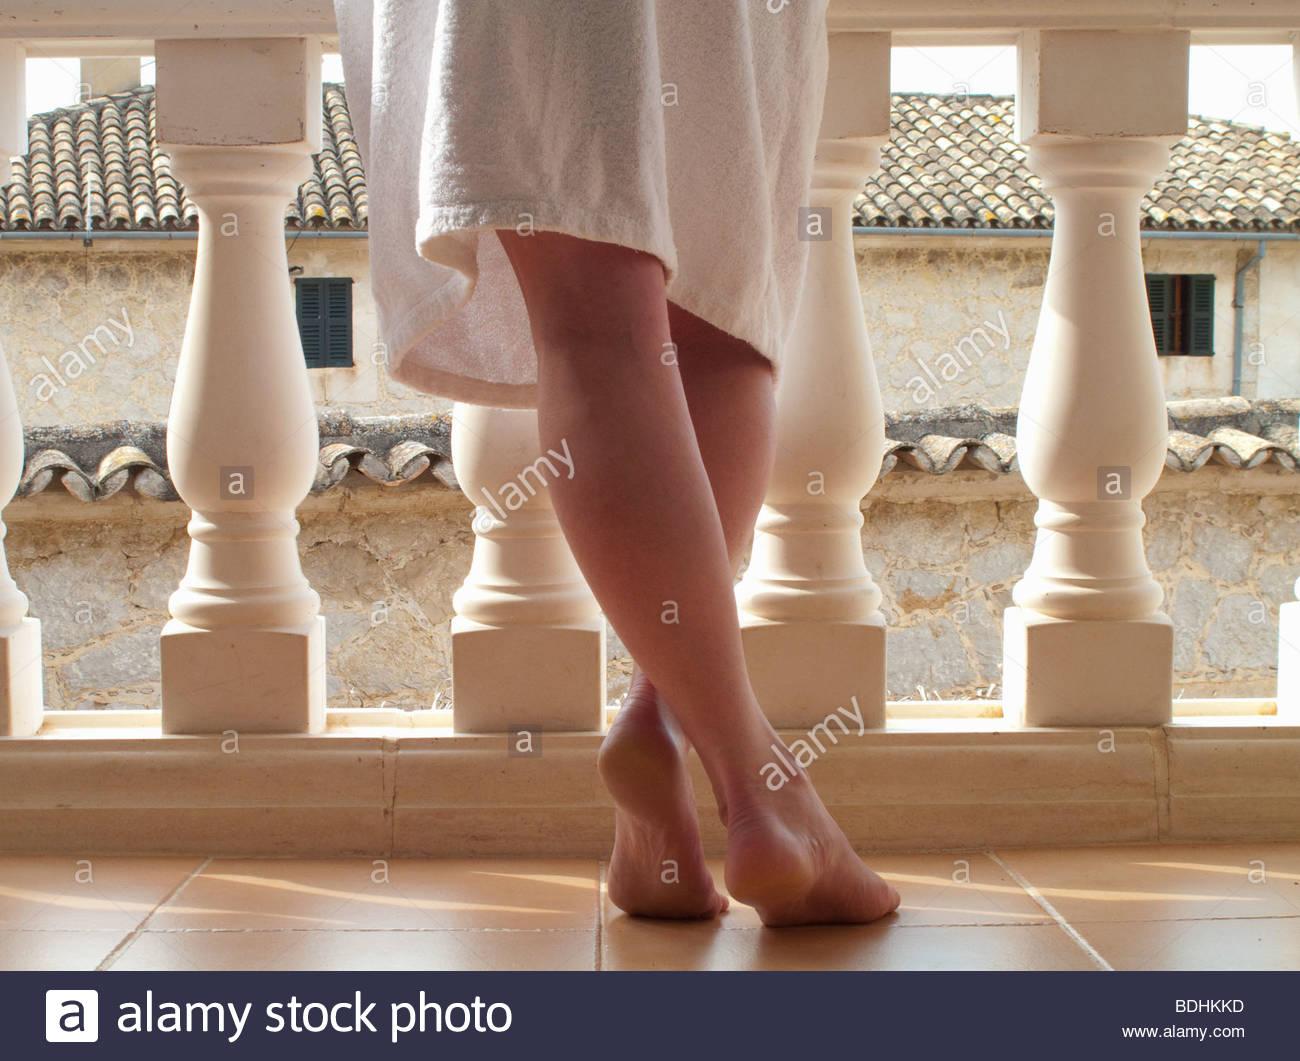 Les pieds nus de femme en peignoir à balustrade balcon Photo Stock